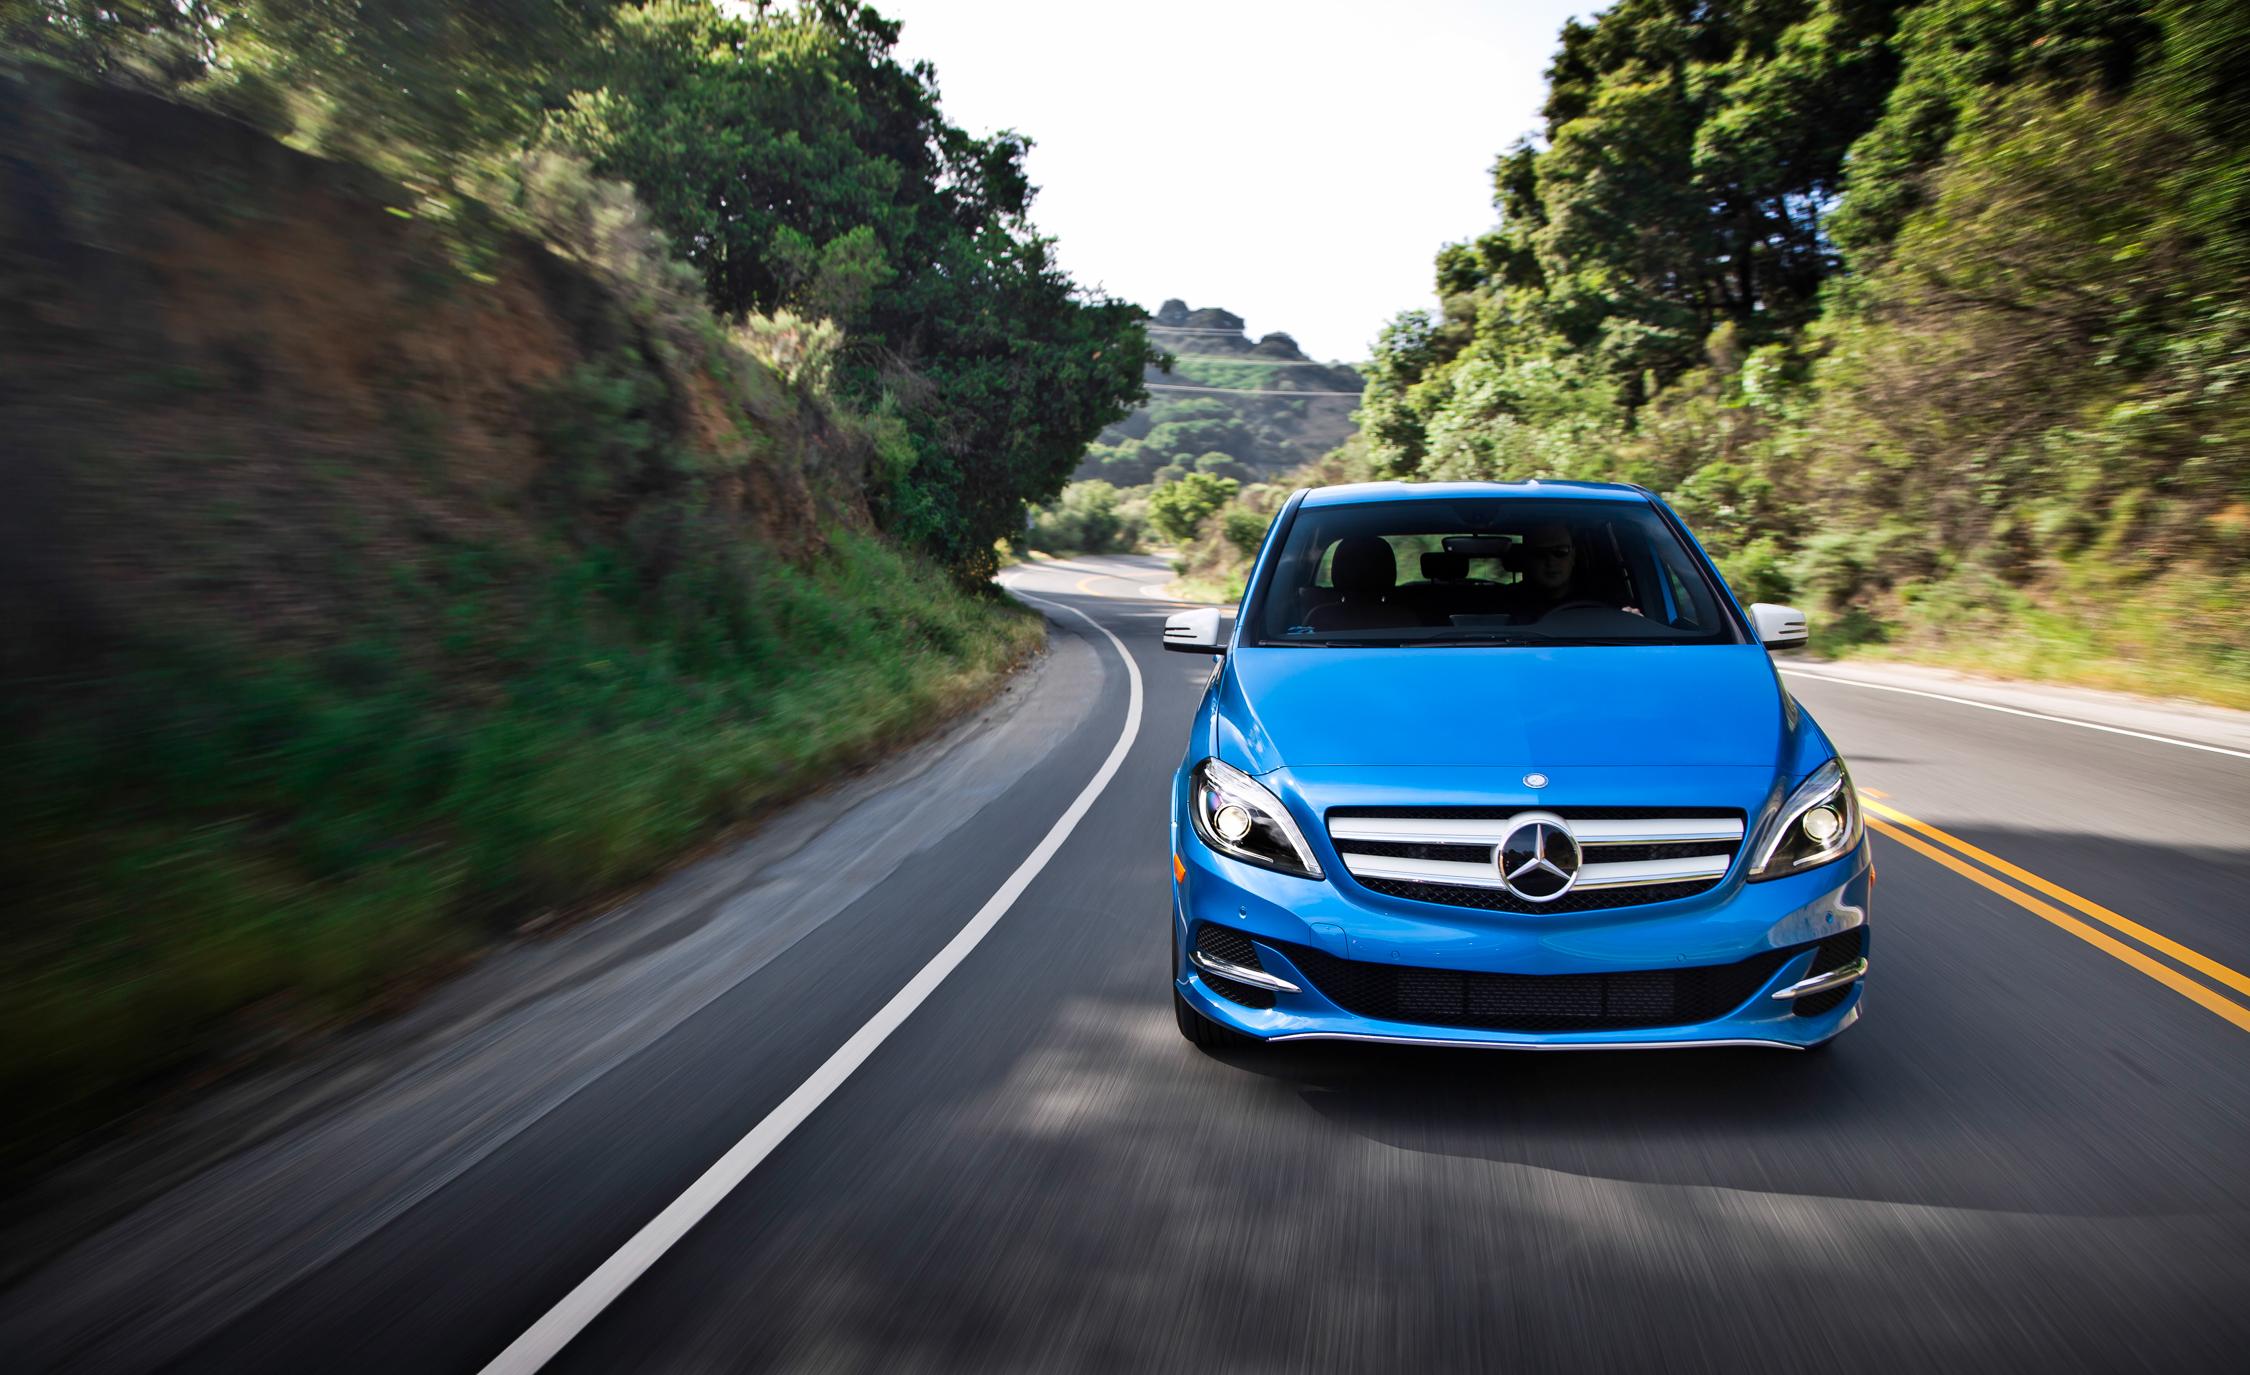 2014 Mercedes-Benz B-class Electric Drive Exterior Front View